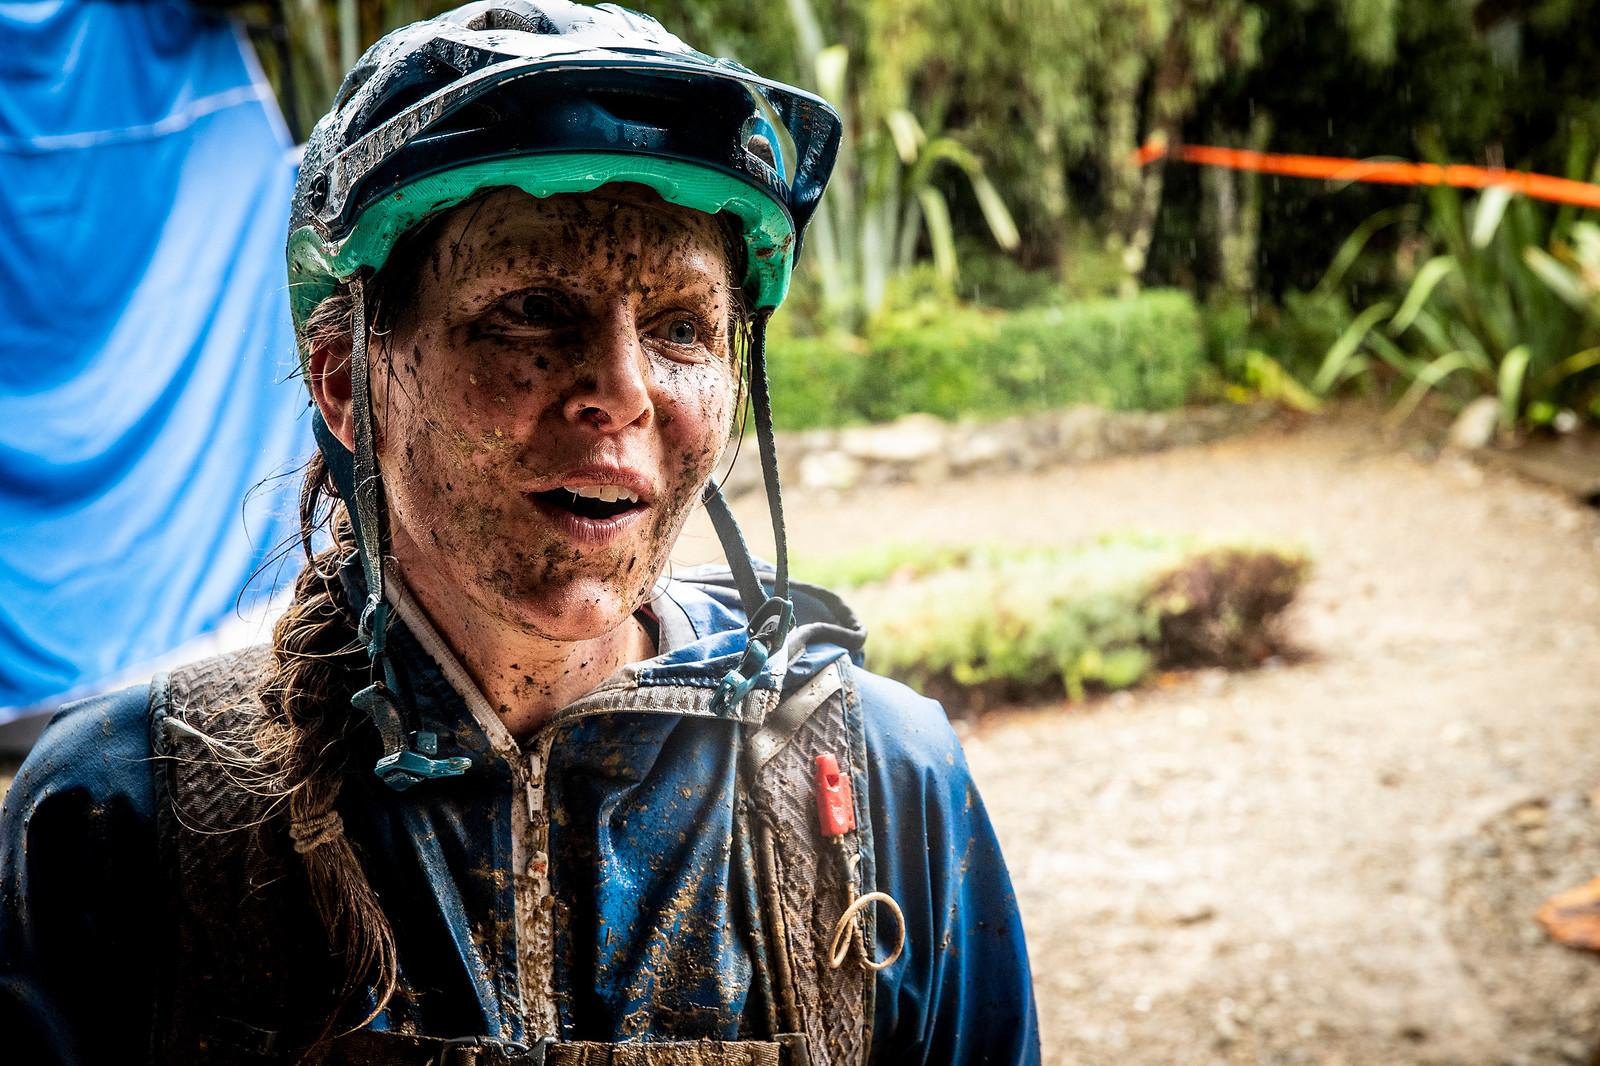 NZEnduro19  m1 8564 - 2019 NZ Enduro Day 2 Photo Gallery - Mountain Biking Pictures - Vital MTB